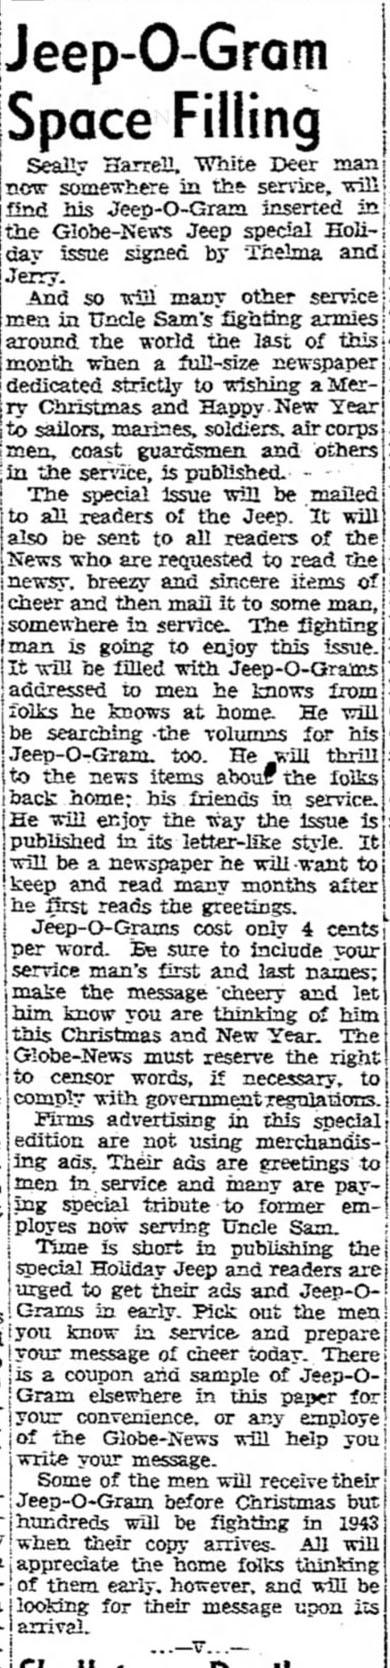 1942-11-13-amarillo-daily-news-jeep-o-grams